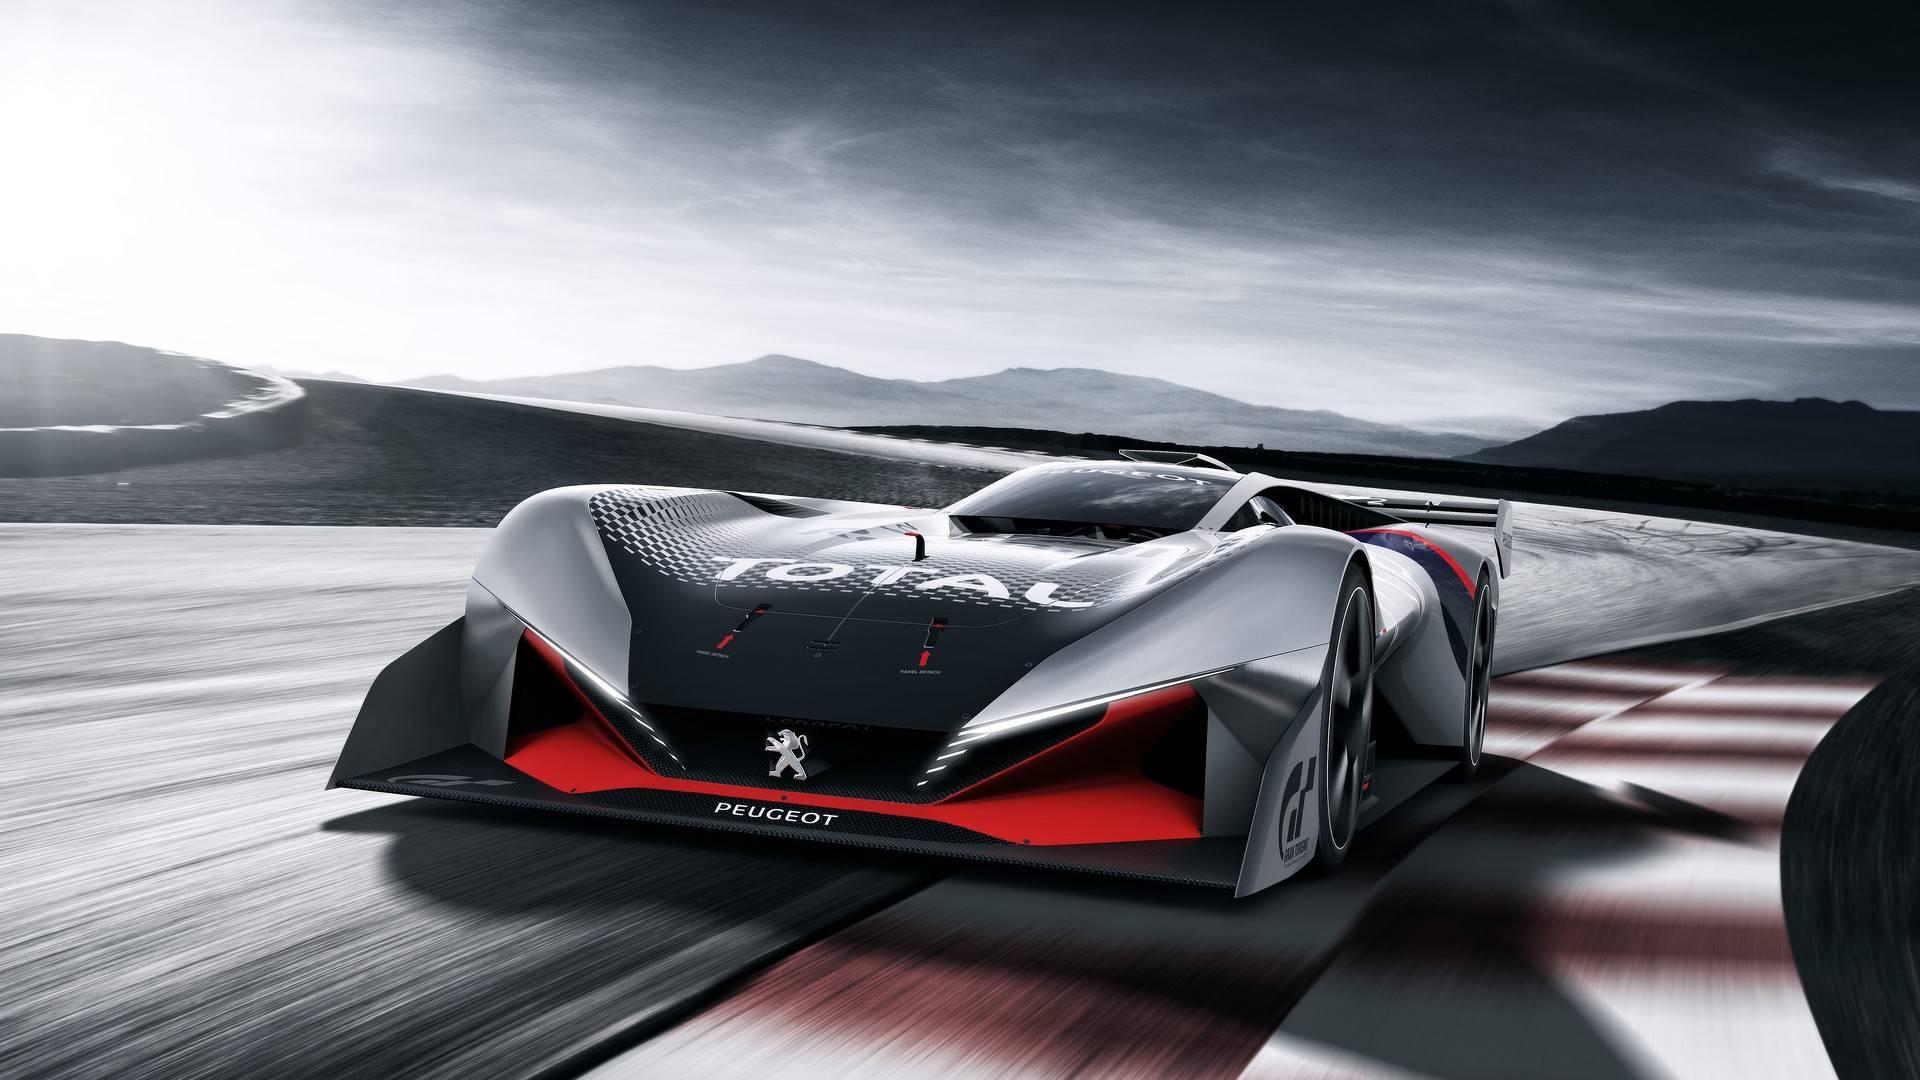 peugeot-l750-r-hybrid-vision-gran-turismo (1)